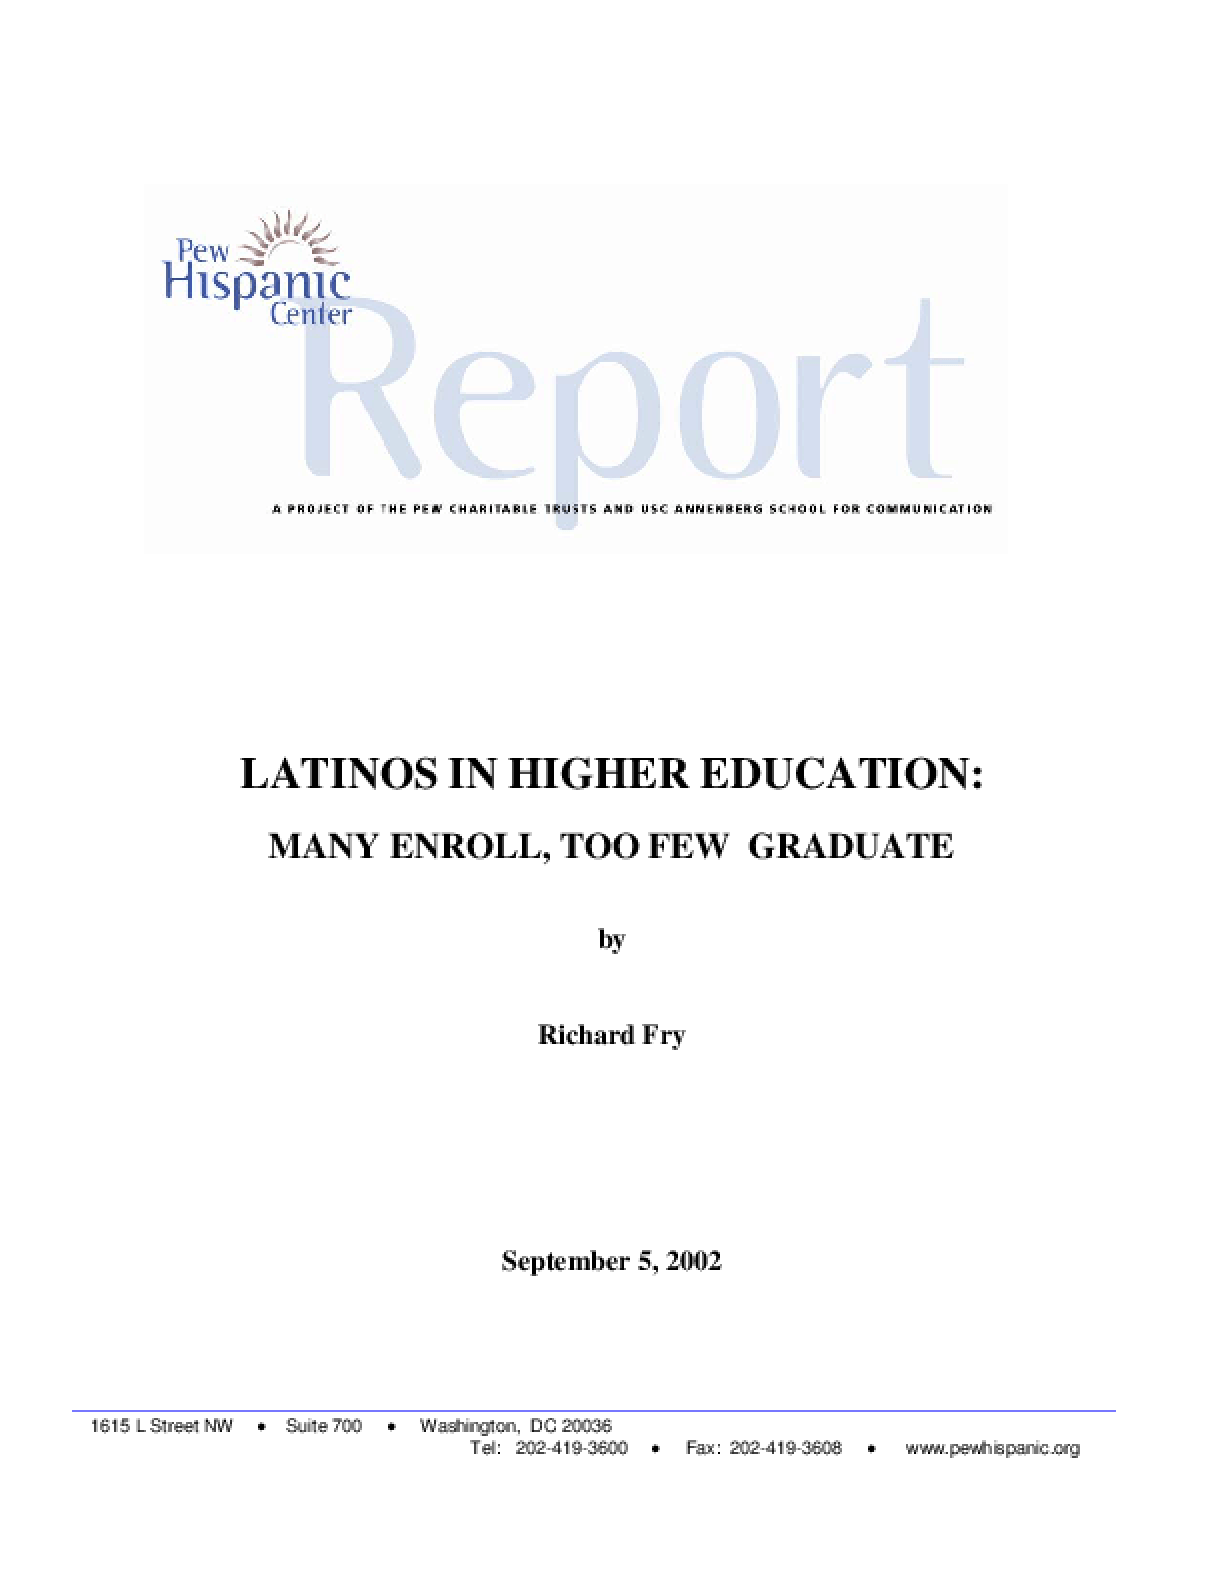 Latinos in Higher Education: Many Enroll, Too Few Graduate